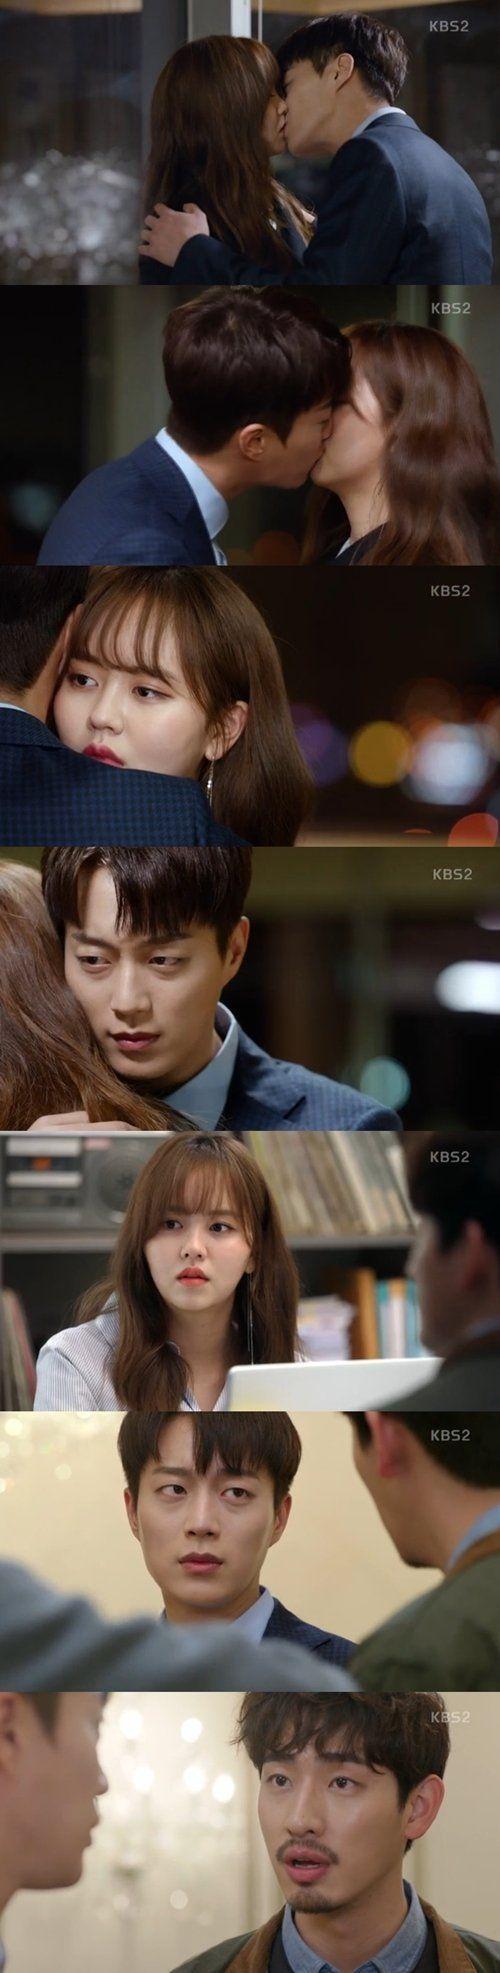 "[Spoiler] ""Radio Romance"" Yoon Doo-joon and Kim So-hyun Share Their First Kiss"